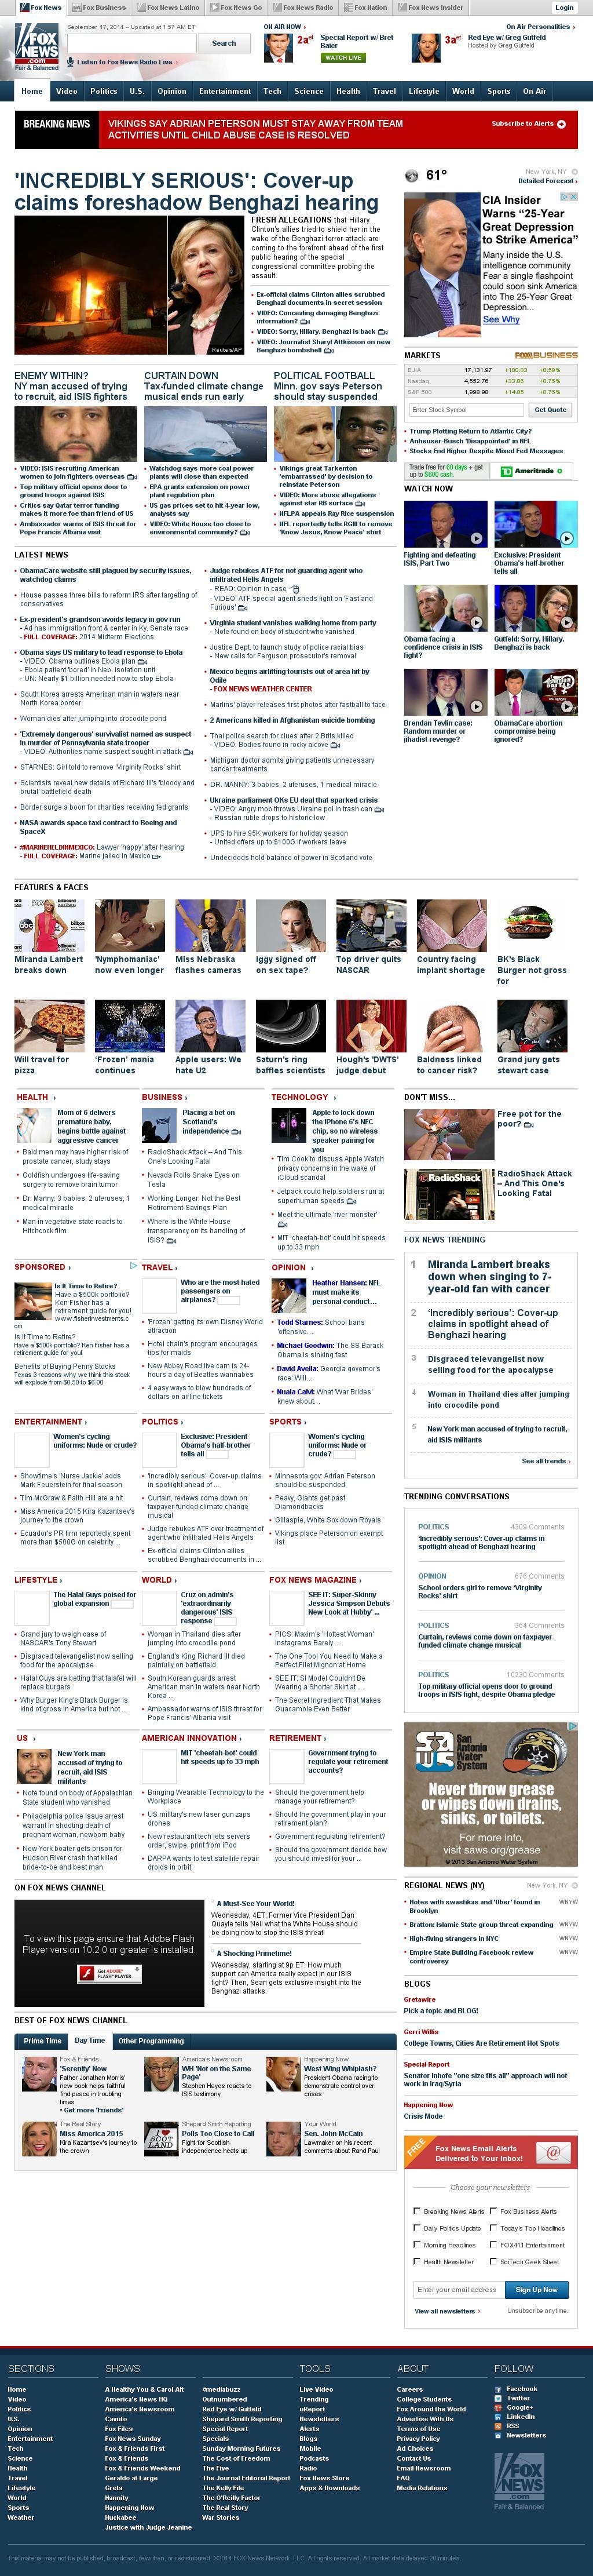 Fox News at Wednesday Sept. 17, 2014, 7:06 a.m. UTC